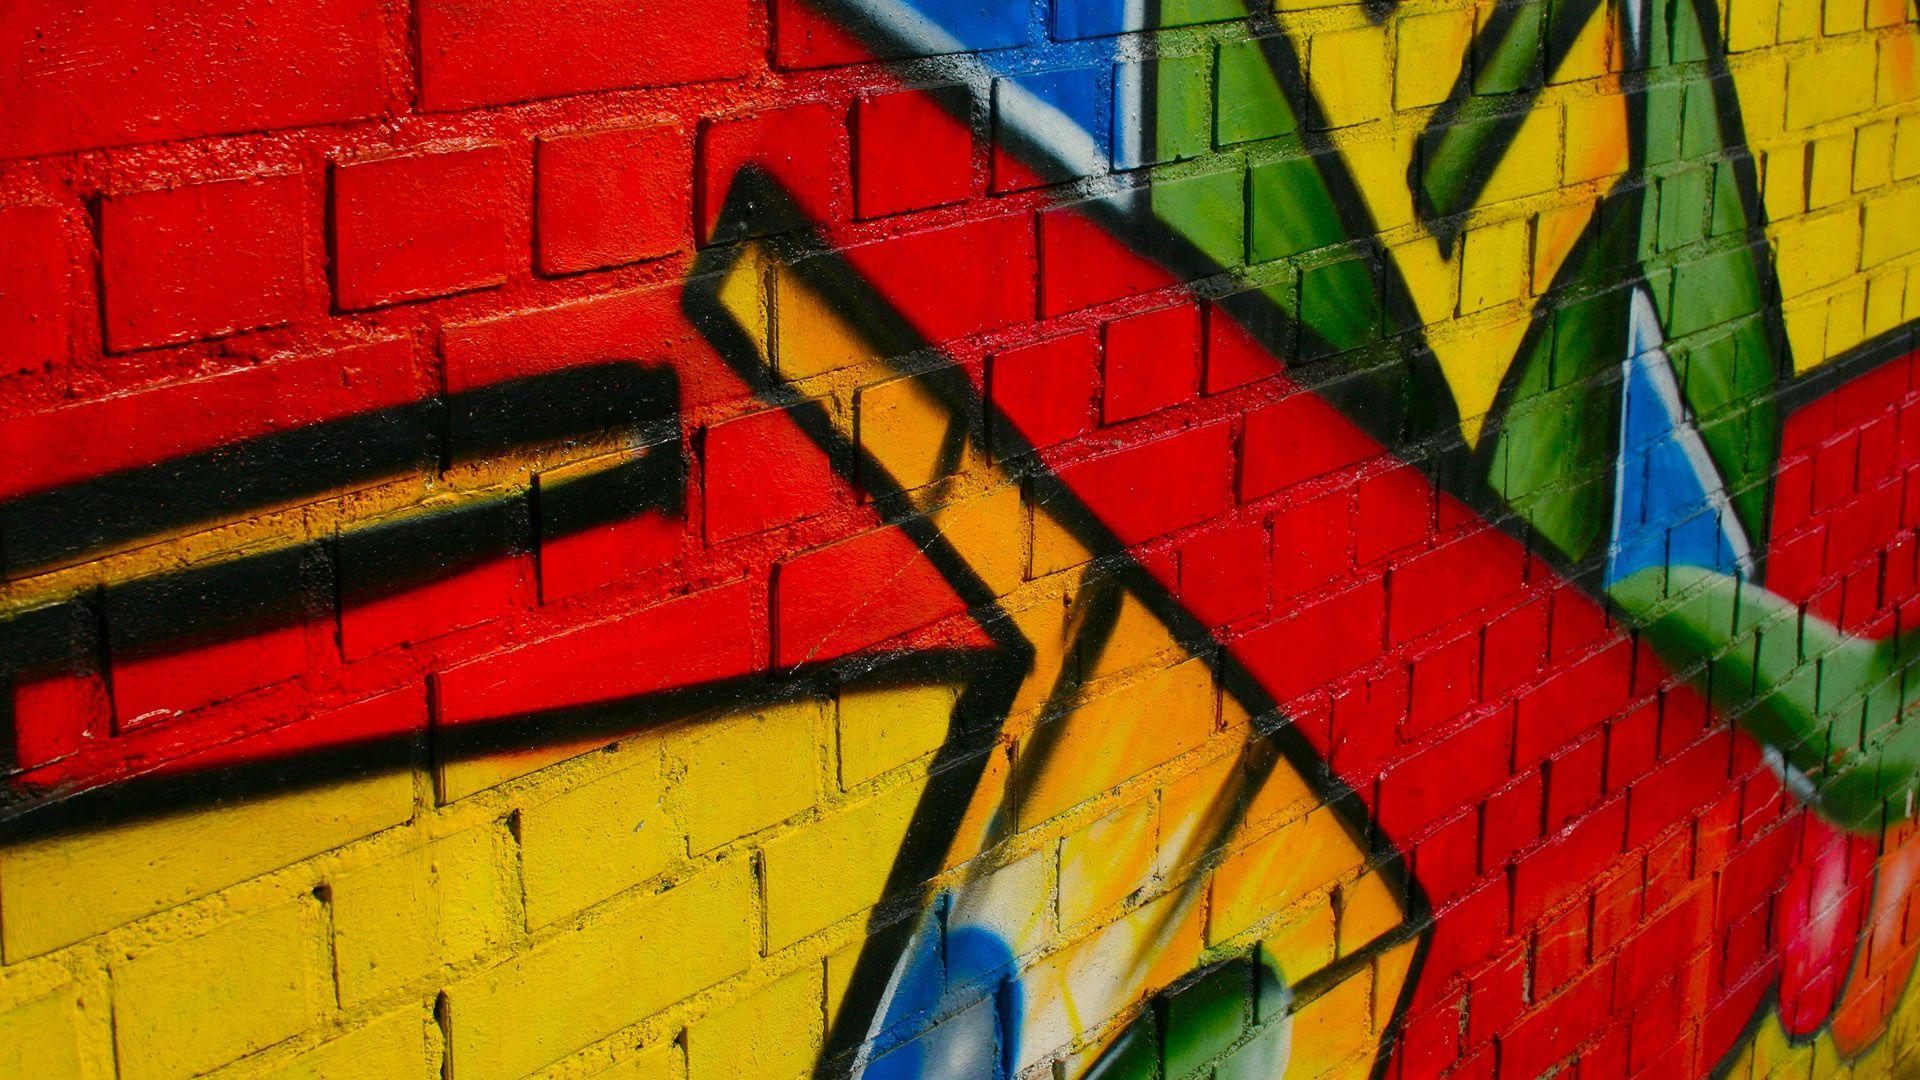 Street Art hd wallpaper download